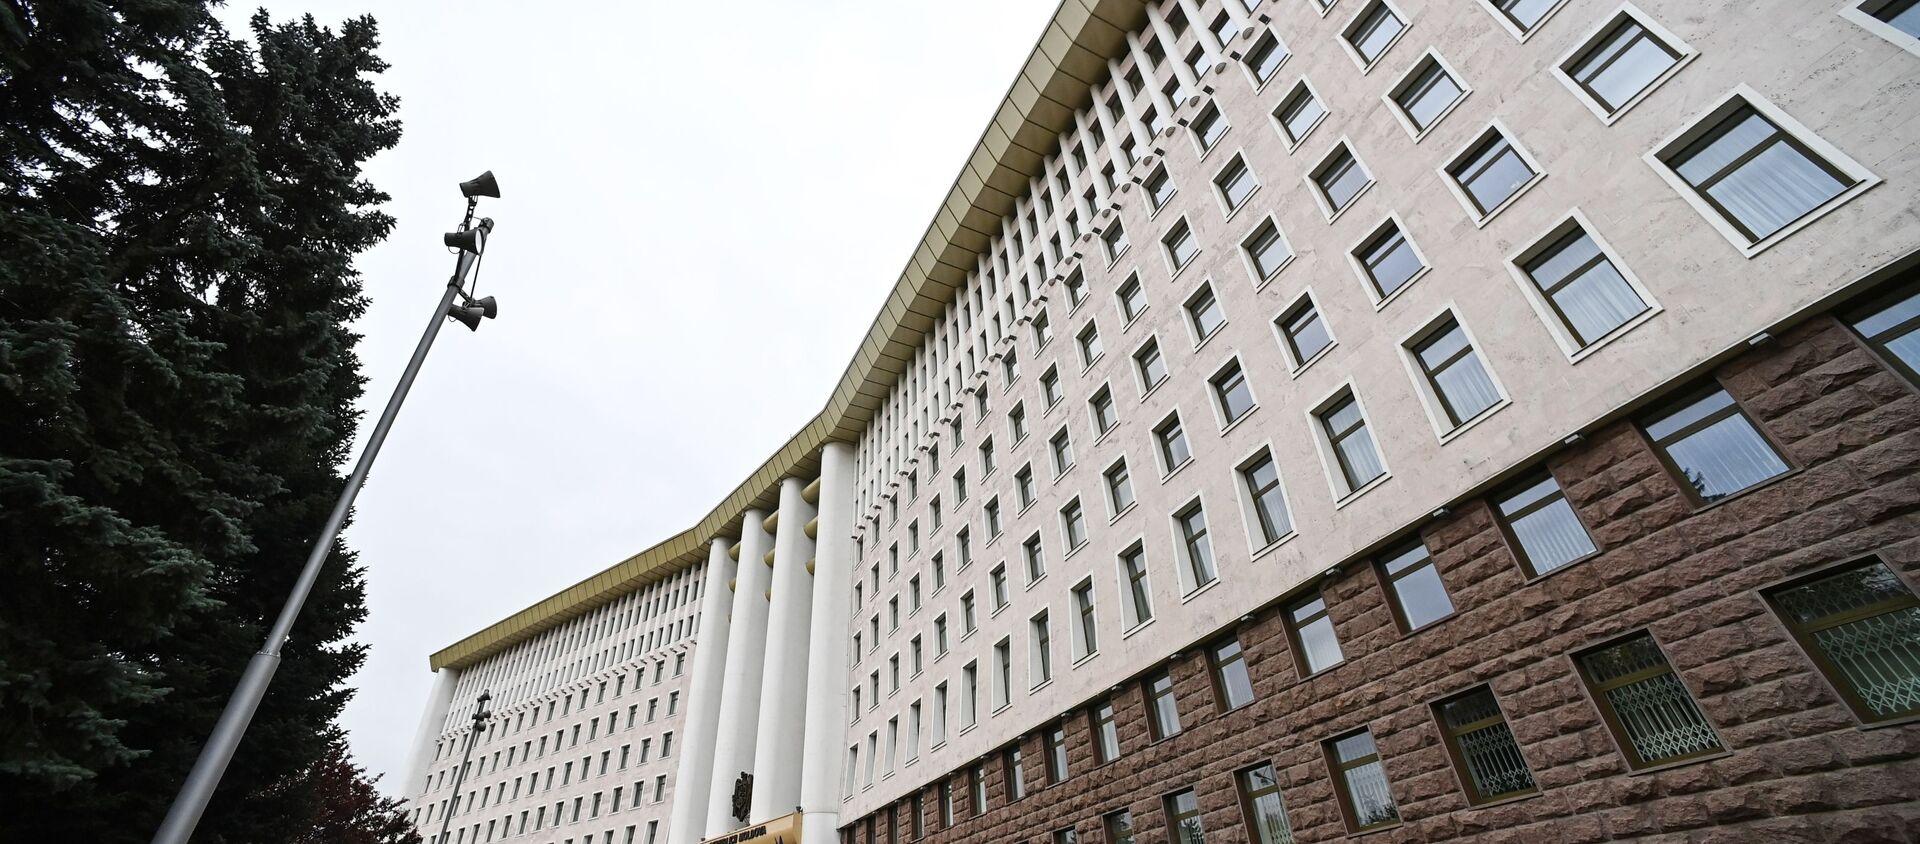 Здание Парламента в Кишиневе. - Sputnik Абхазия, 1920, 24.11.2020